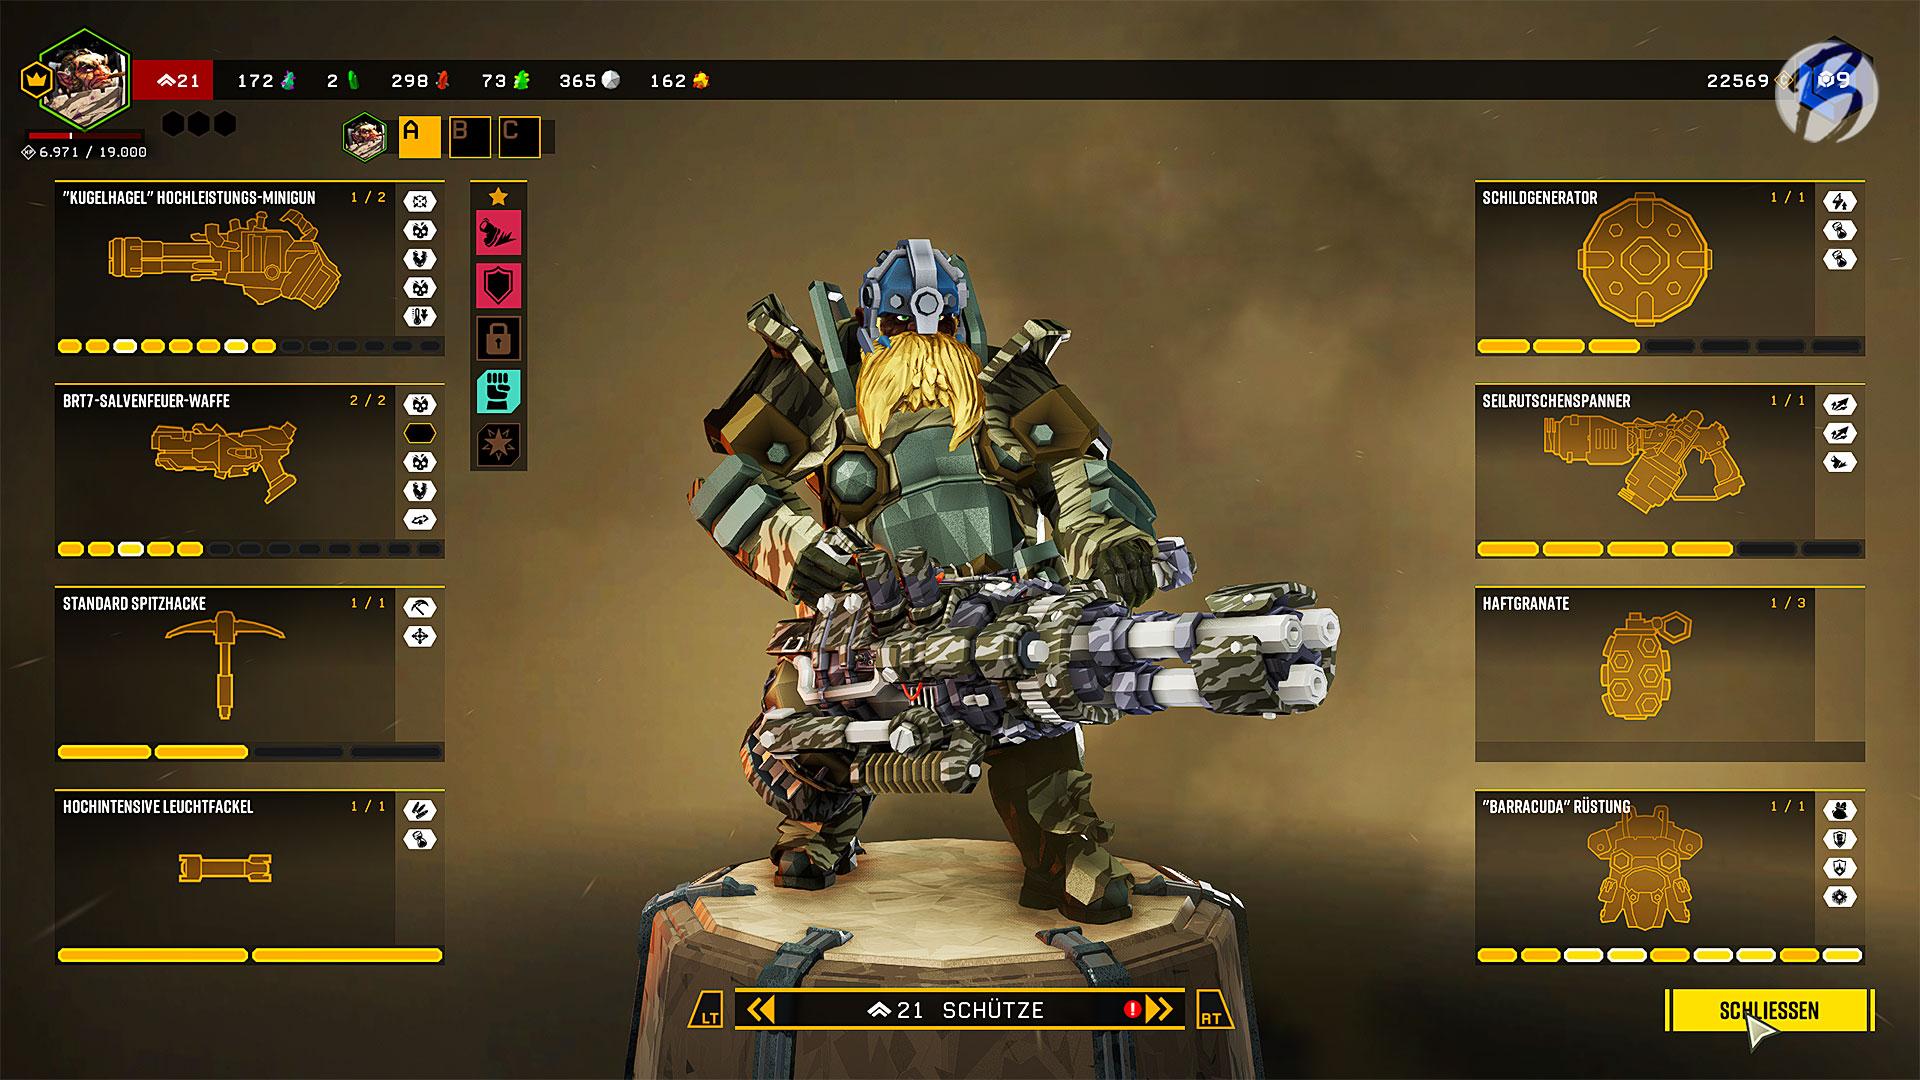 Deep Rock Galactic - Schütze: Ausrüstung, Perks und Modifikationen.